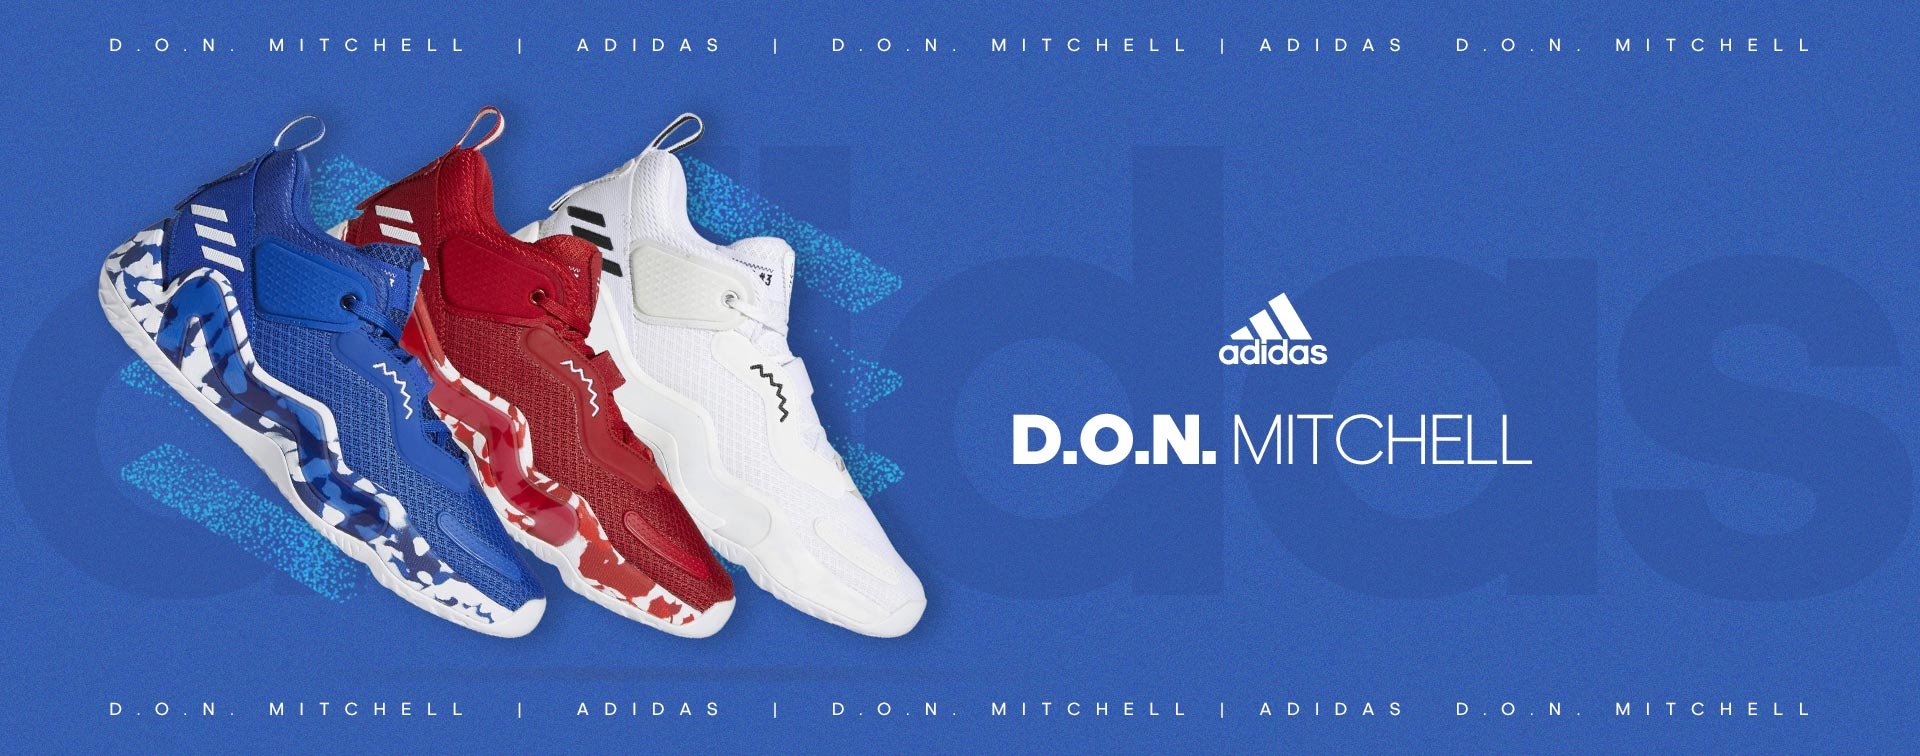 Basketballschuhe adidas D.O.N. Mitchell